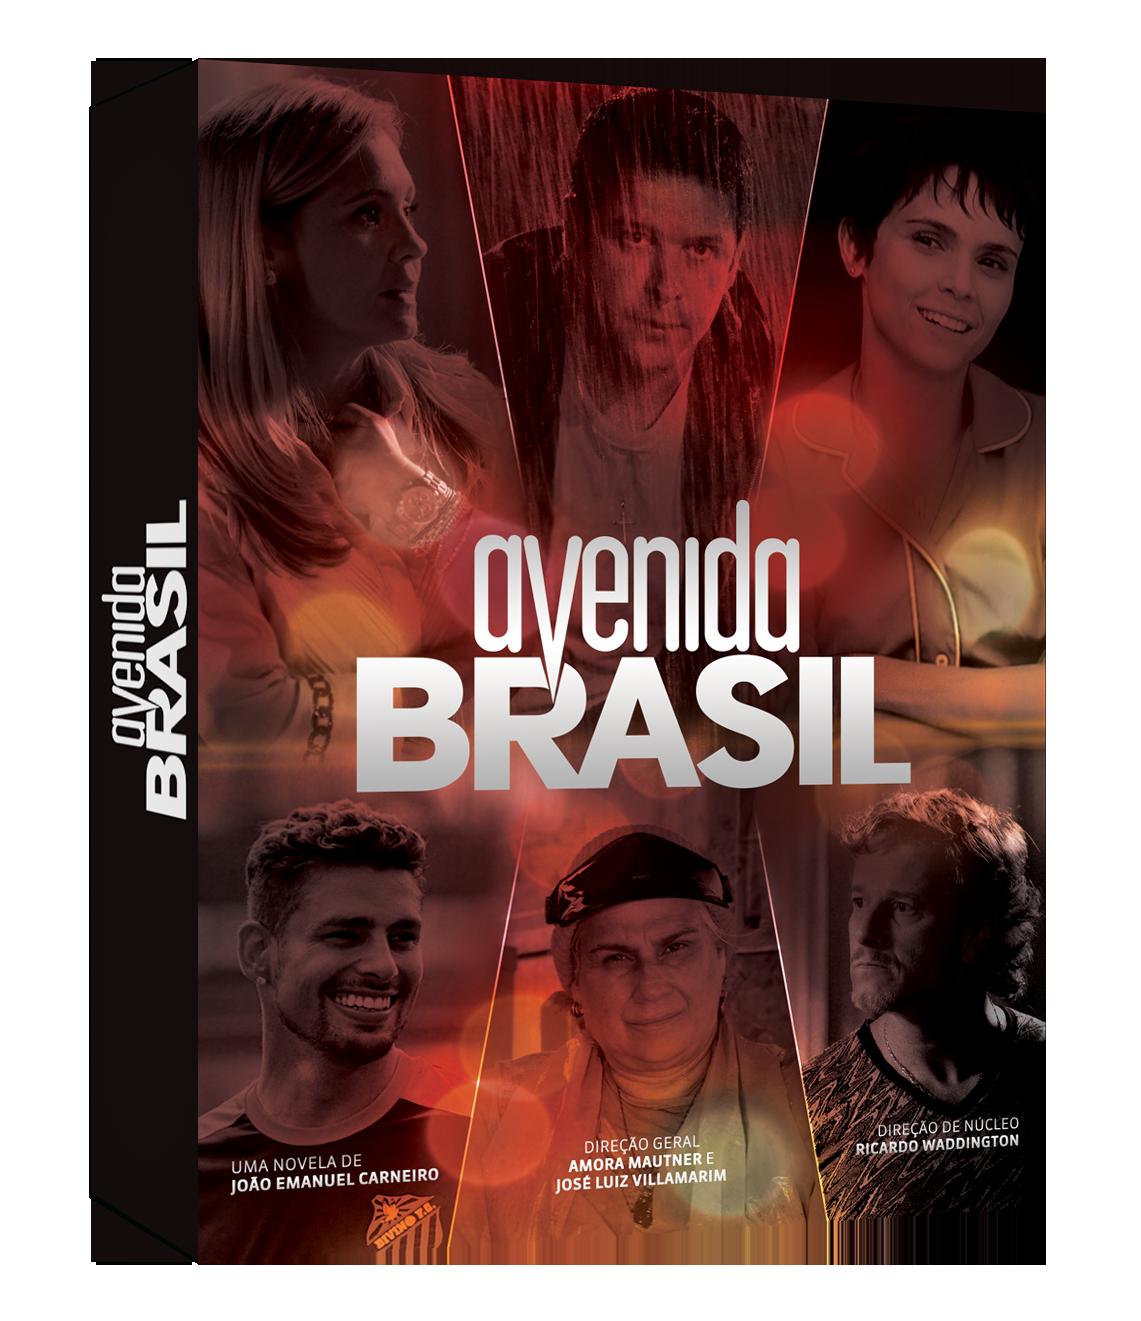 Avenida brasil capitulo 149 completo online dating 2